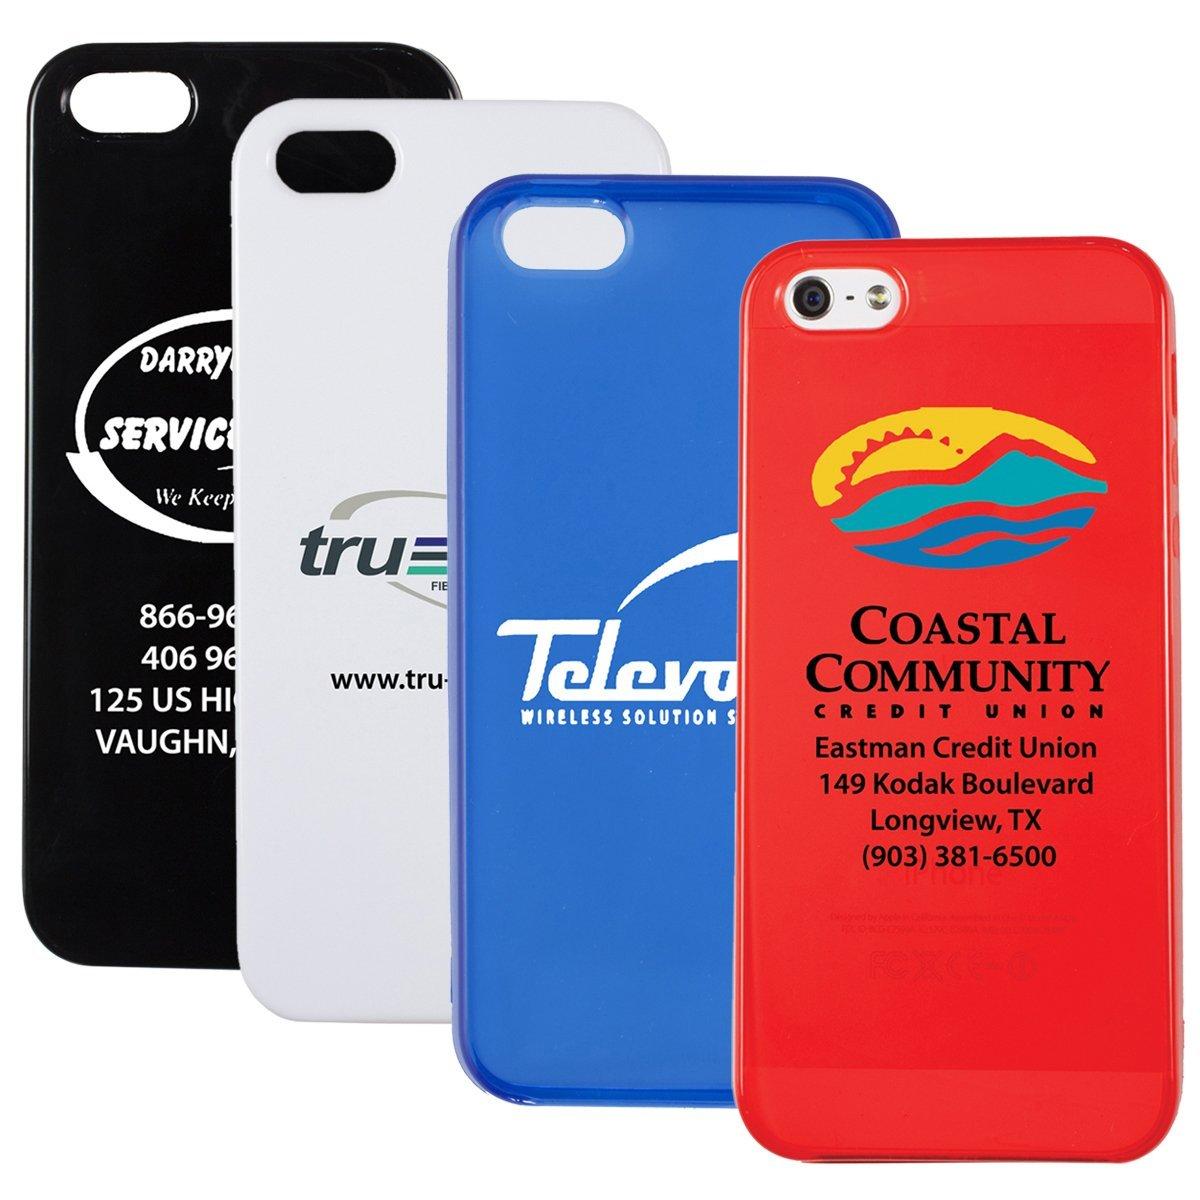 iPhone Case | Jobox Media